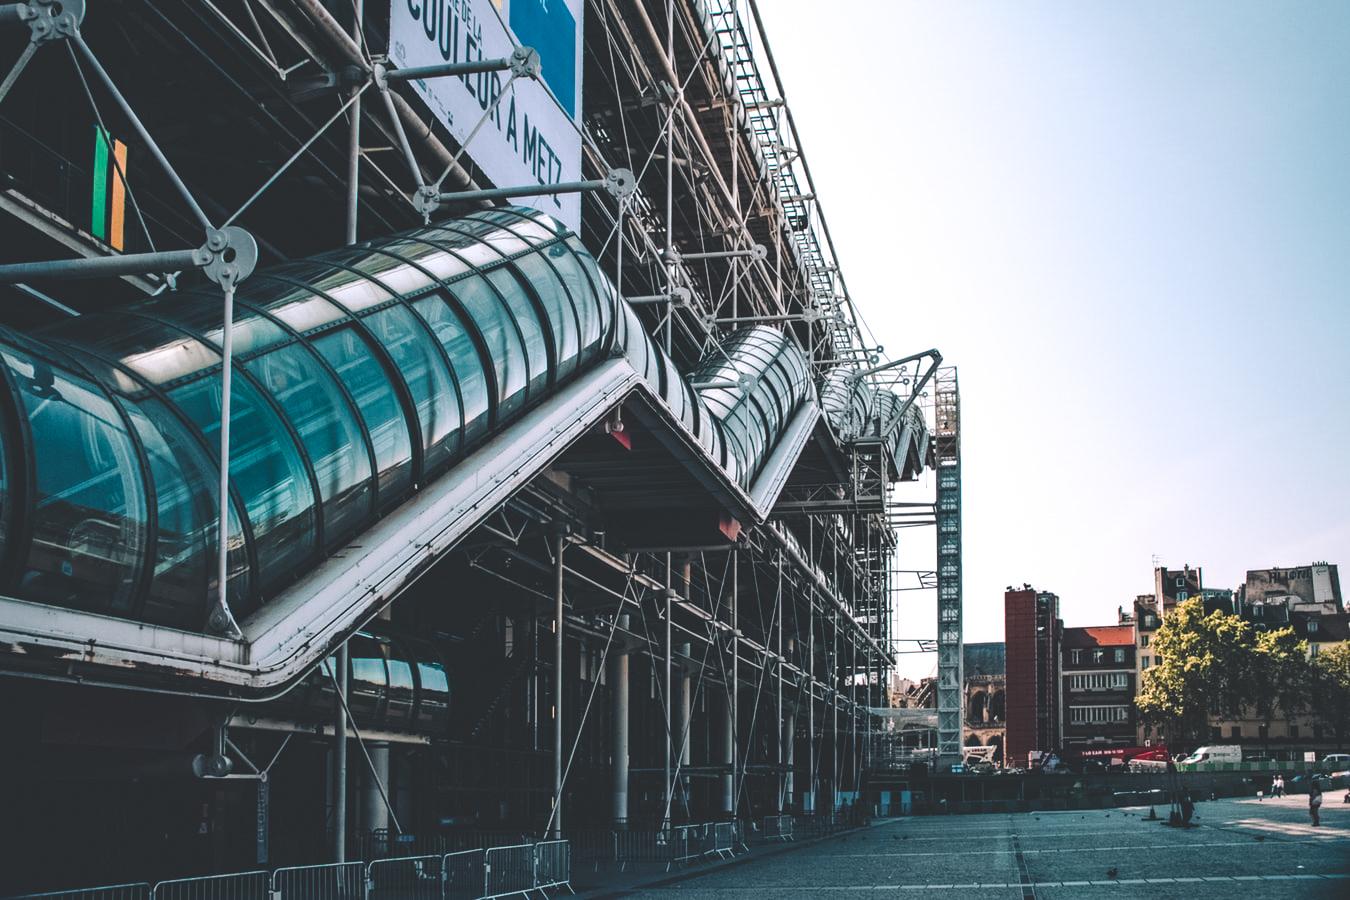 centre pompidou in paris, le marais neighborhood, arrondissement, museum, modern